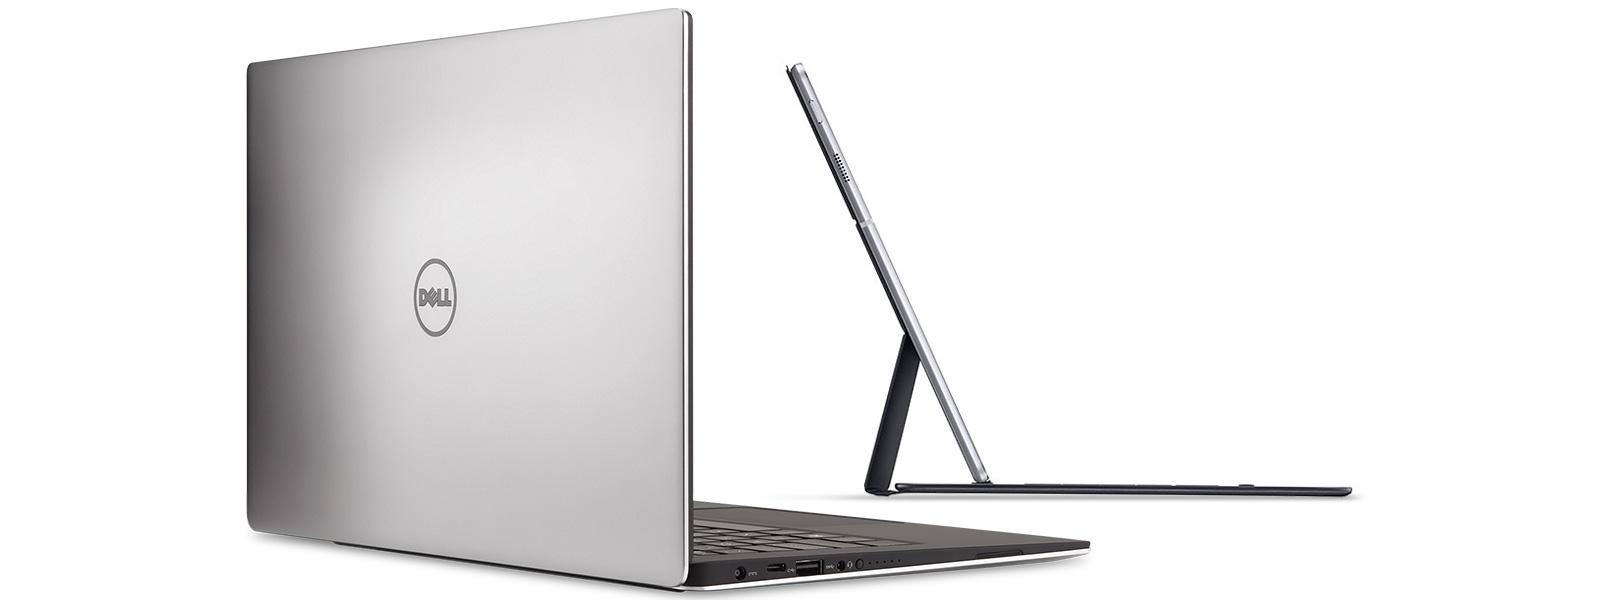 Portátil Windows 10 Dell